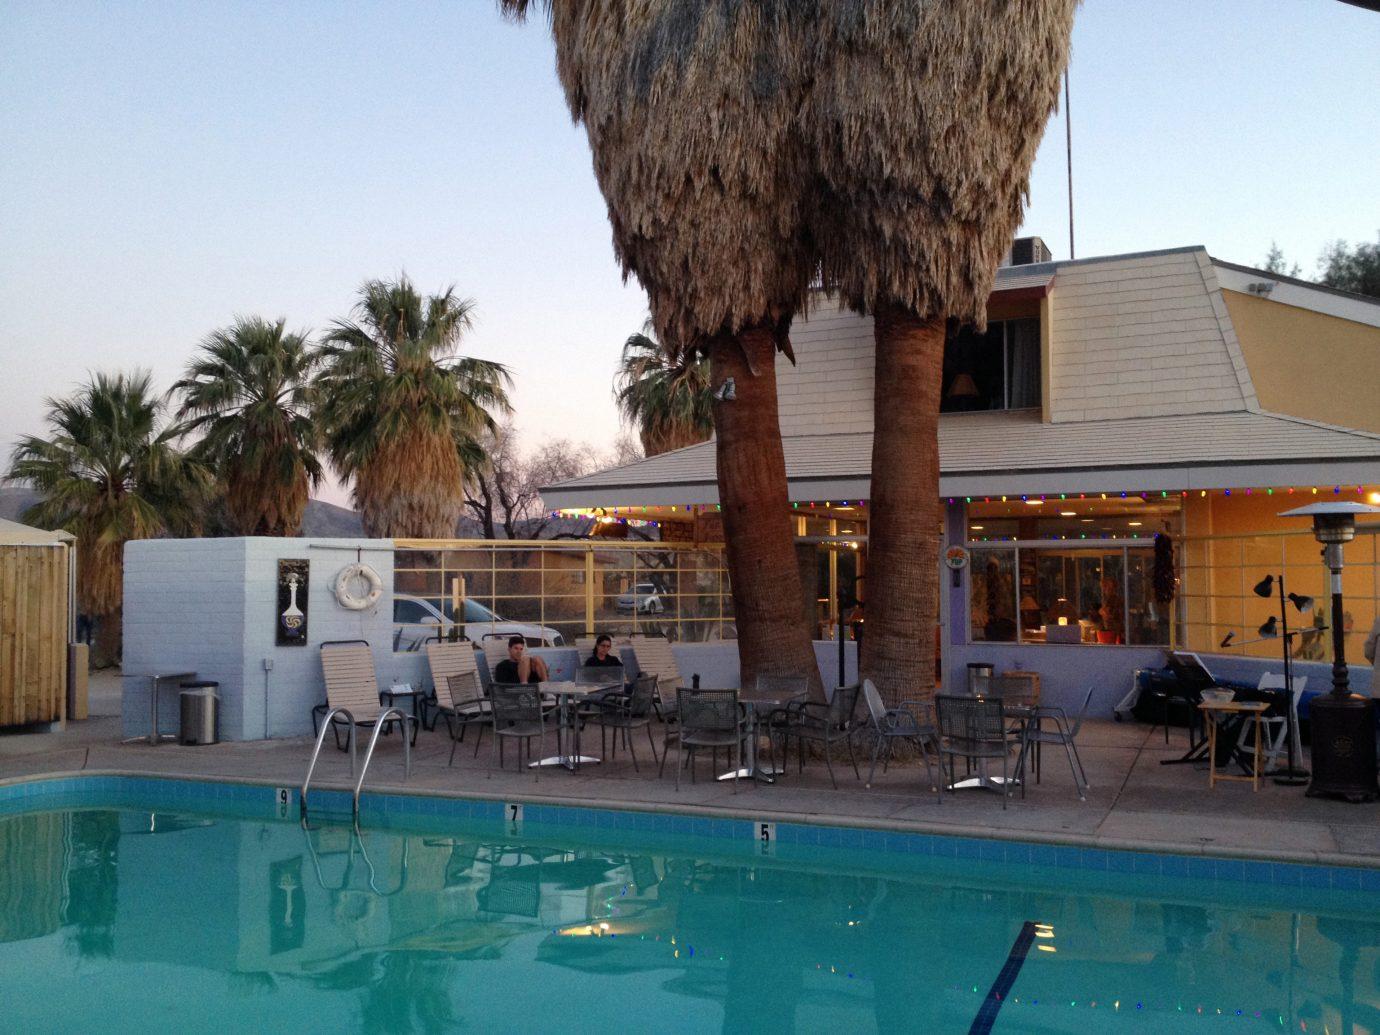 City Influencers + Tastemakers Joshua Tree Travel Tips sky outdoor leisure property swimming pool Resort vacation estate home Villa